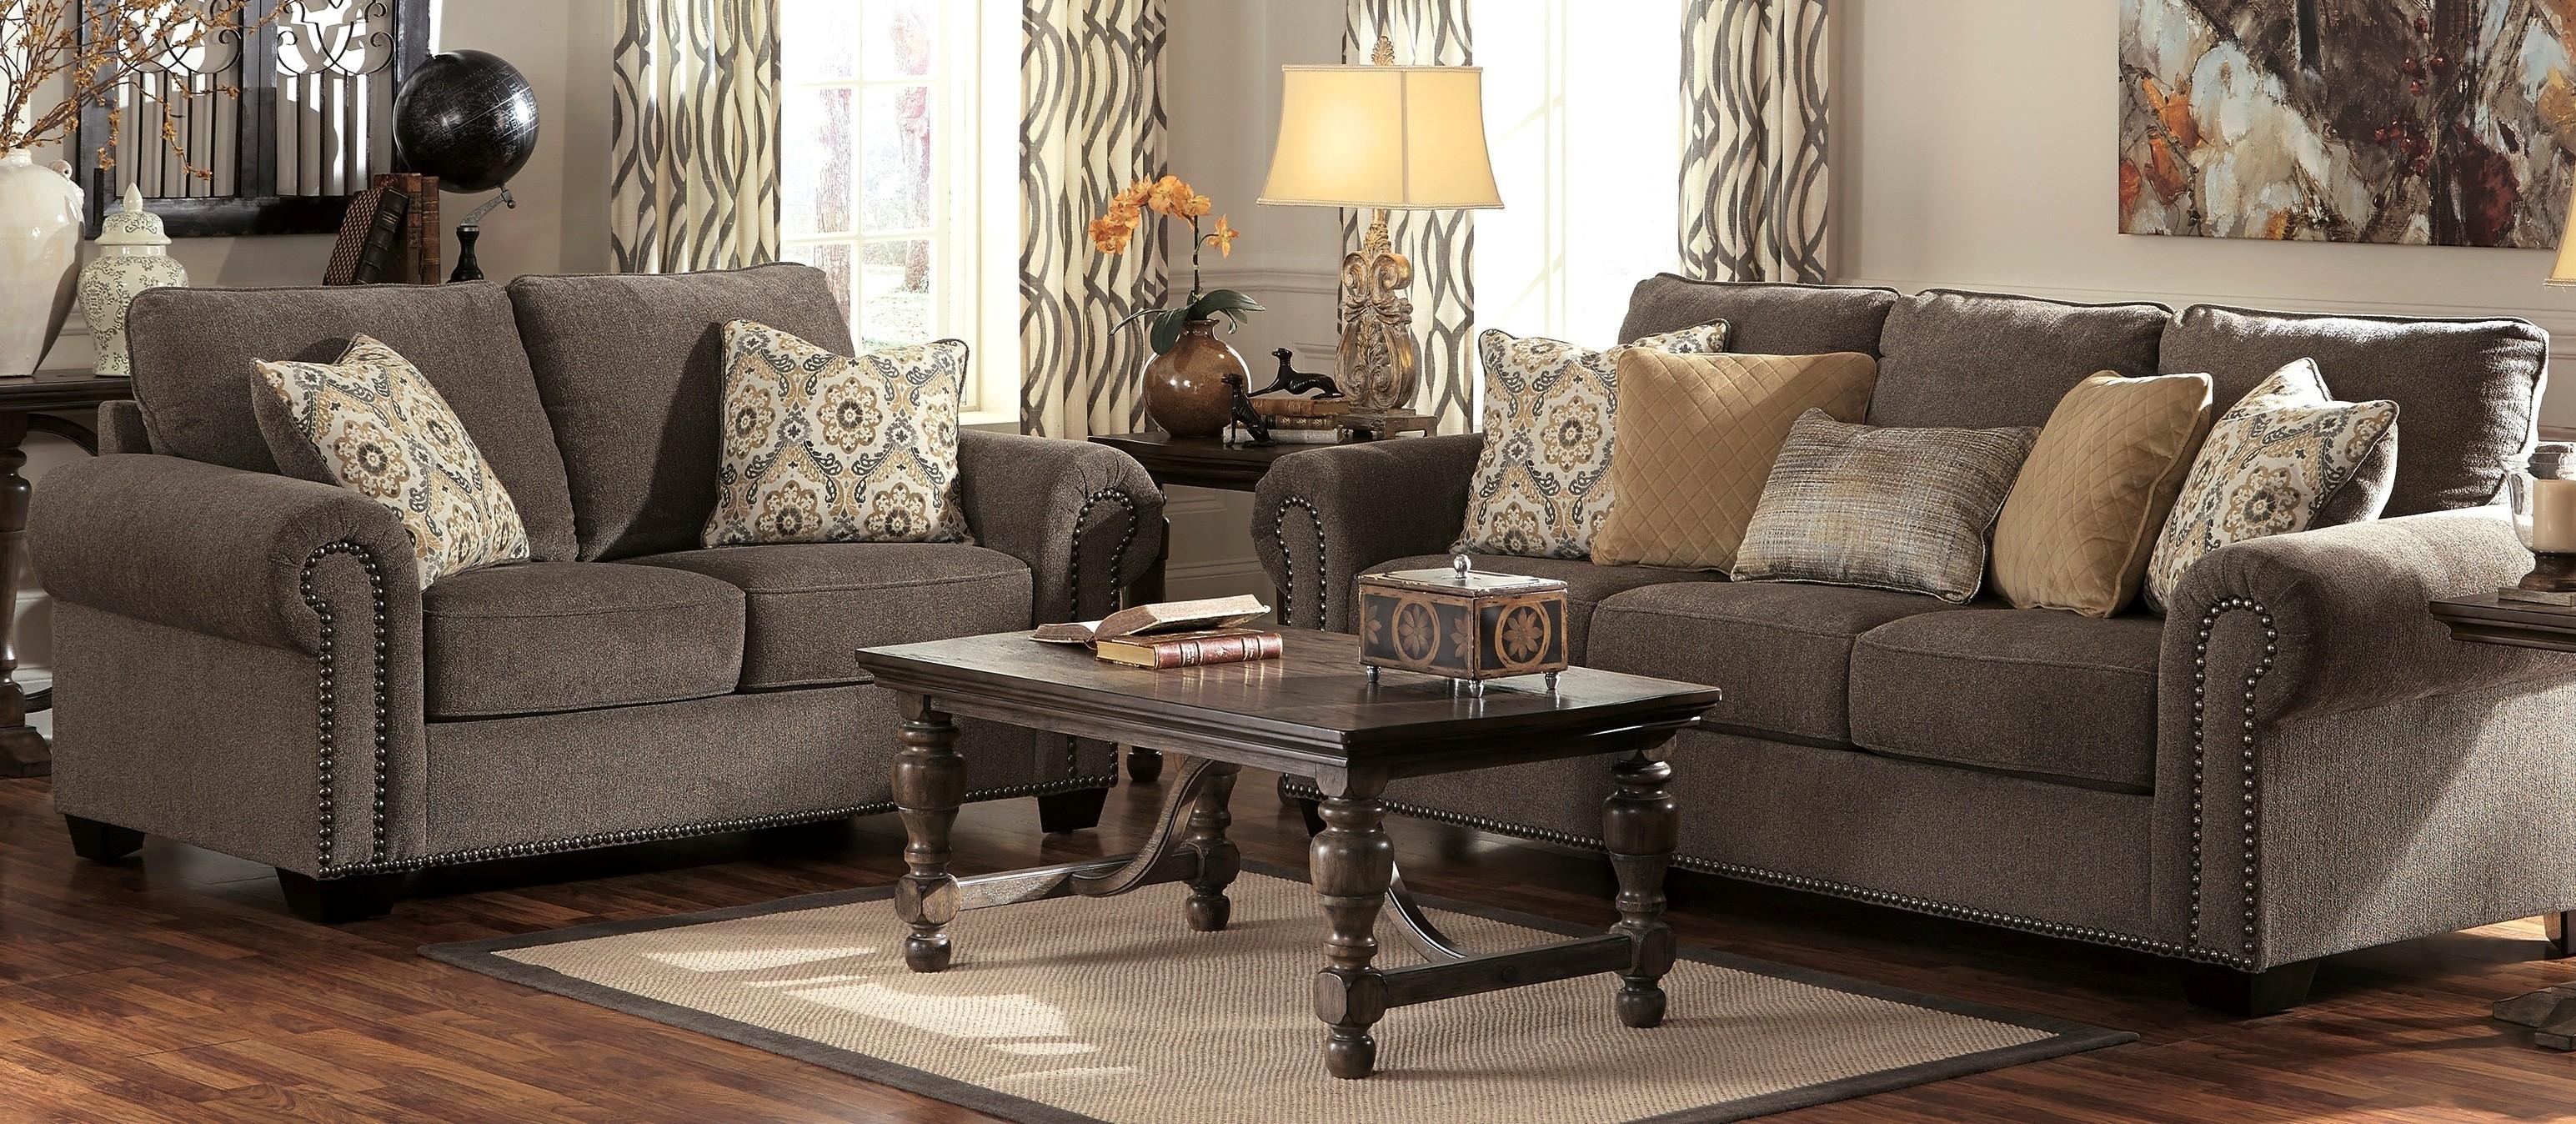 Discount Furniture Stores Richmond Va Macys Furniture Richmond Va throughout Homemakers Sectional Sofas (Image 2 of 10)